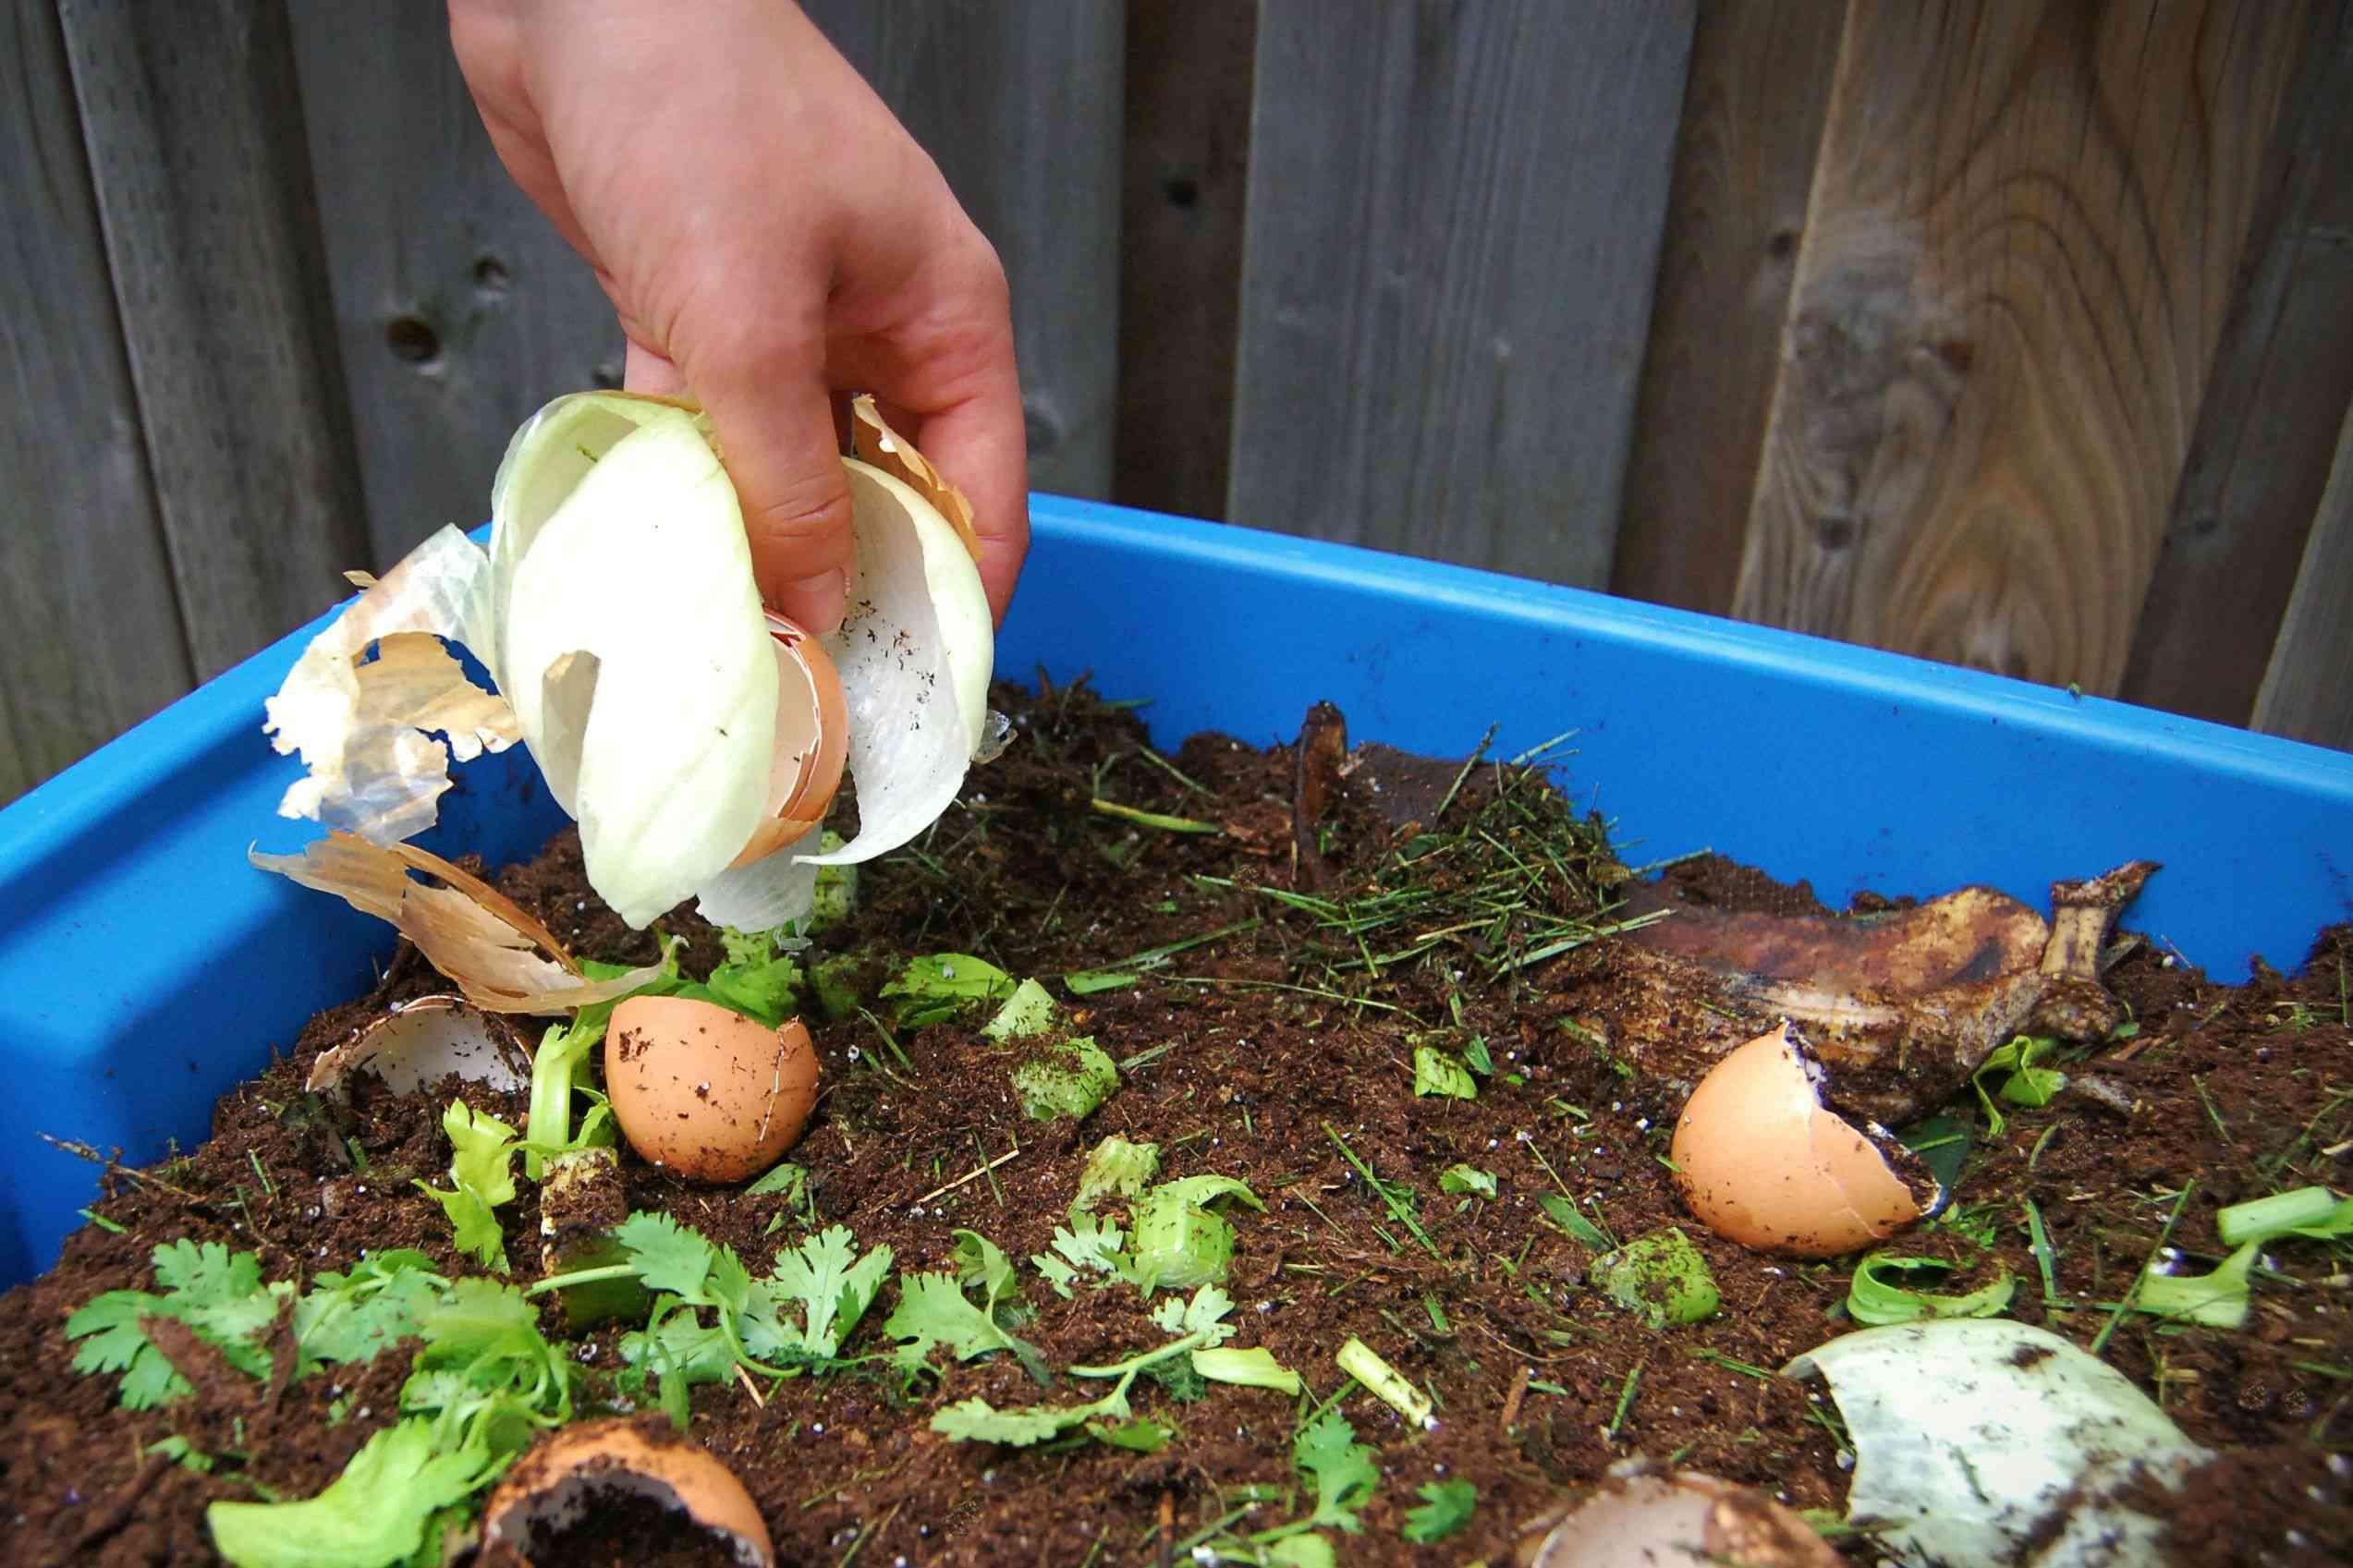 Food scraps and egg shells added to blu composting bin closeup